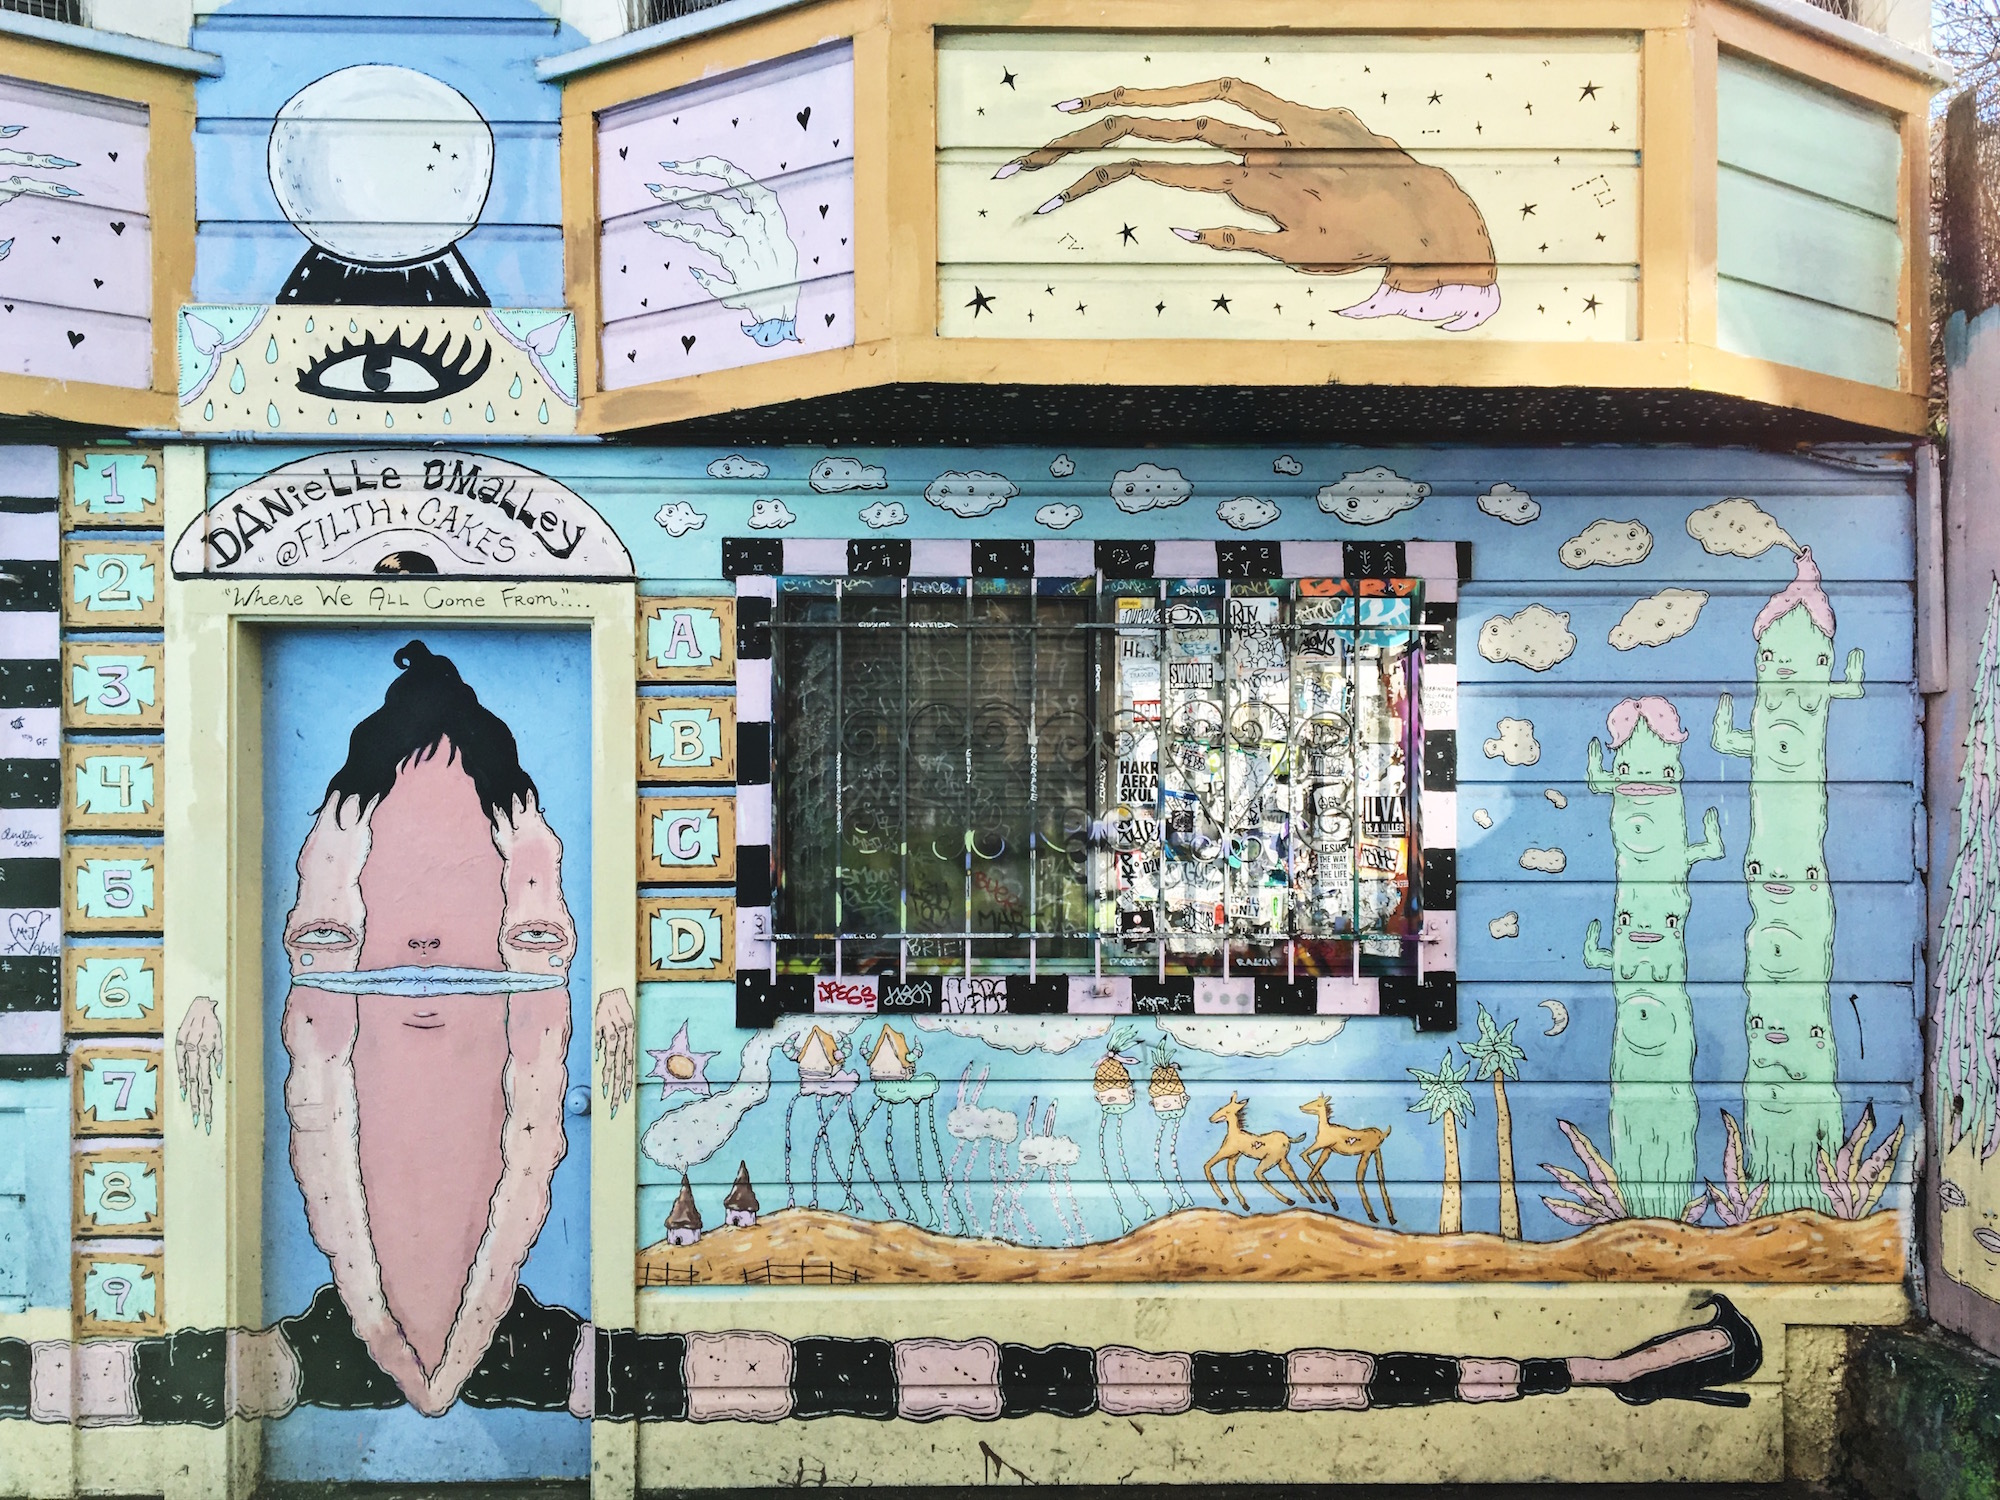 Clarion Alley - Murales nel quartiere Mission di San Francisco - Where we all come from (2015) - Danielle O'Malley